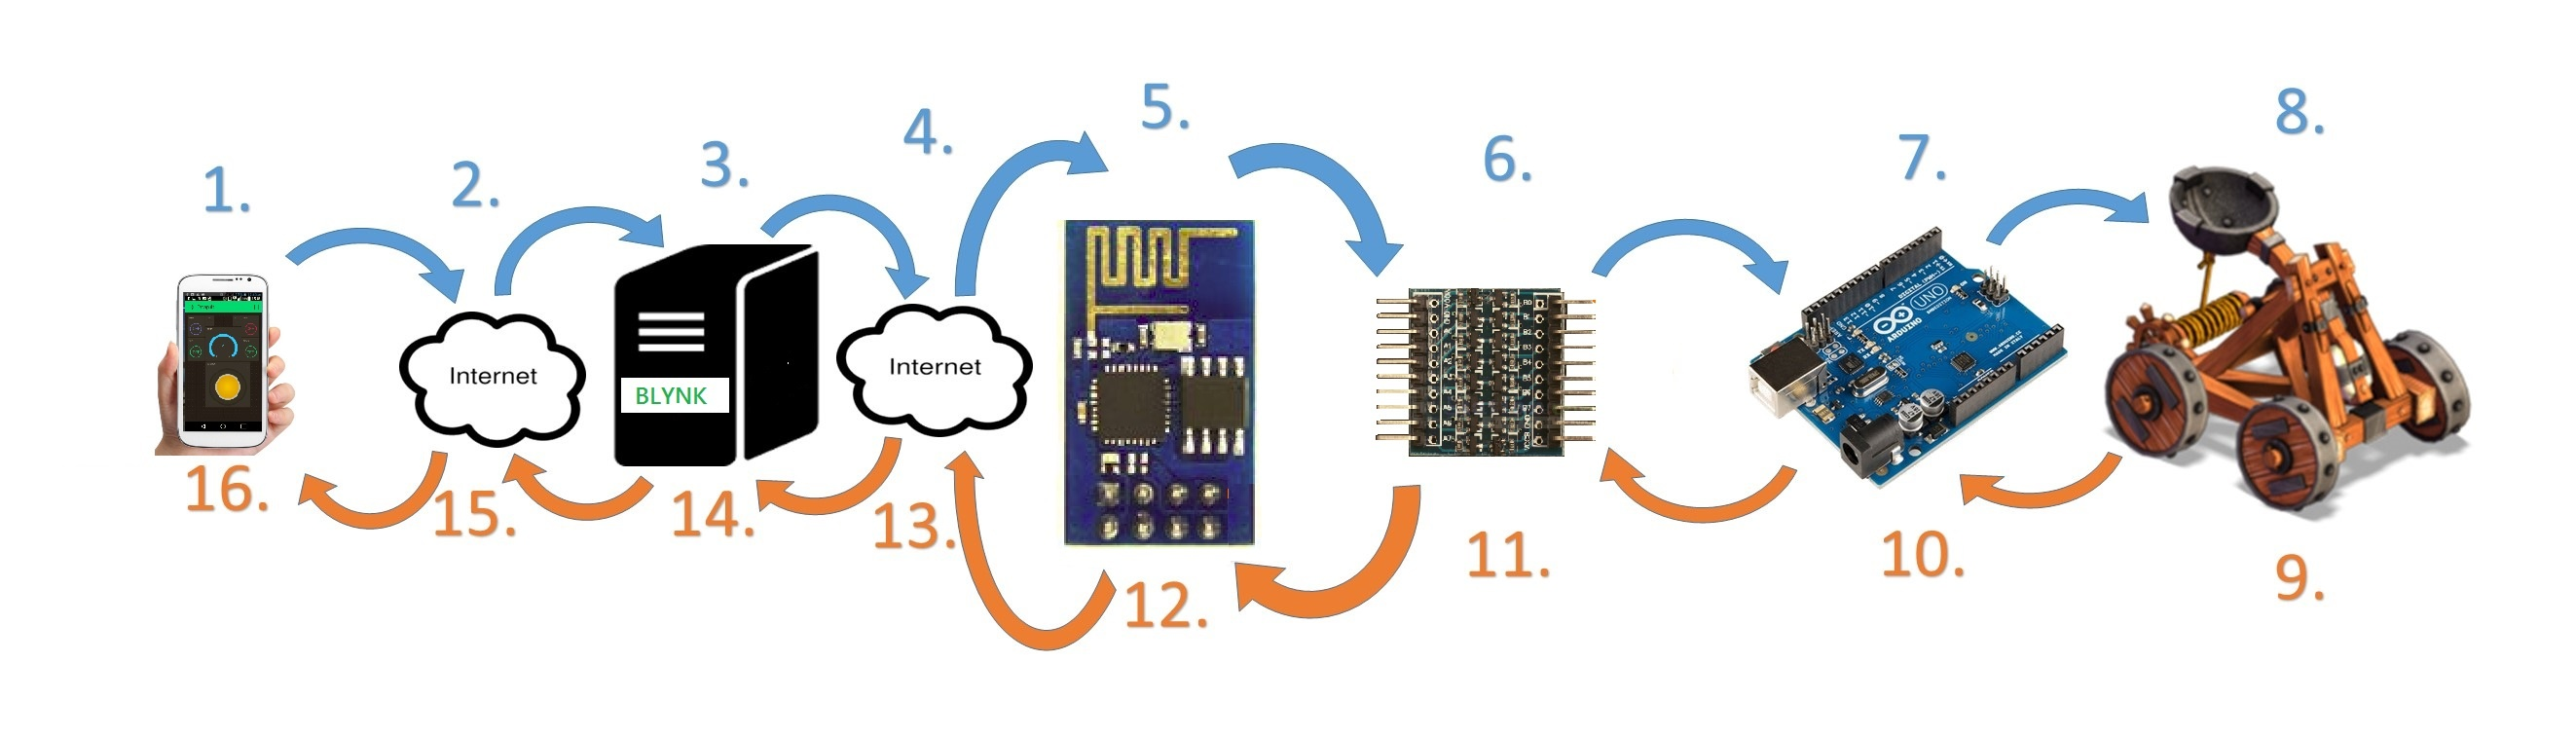 Iot Catapult Mechatronics Exercises Aalto University Wiki Diagram Of A Jpeg File